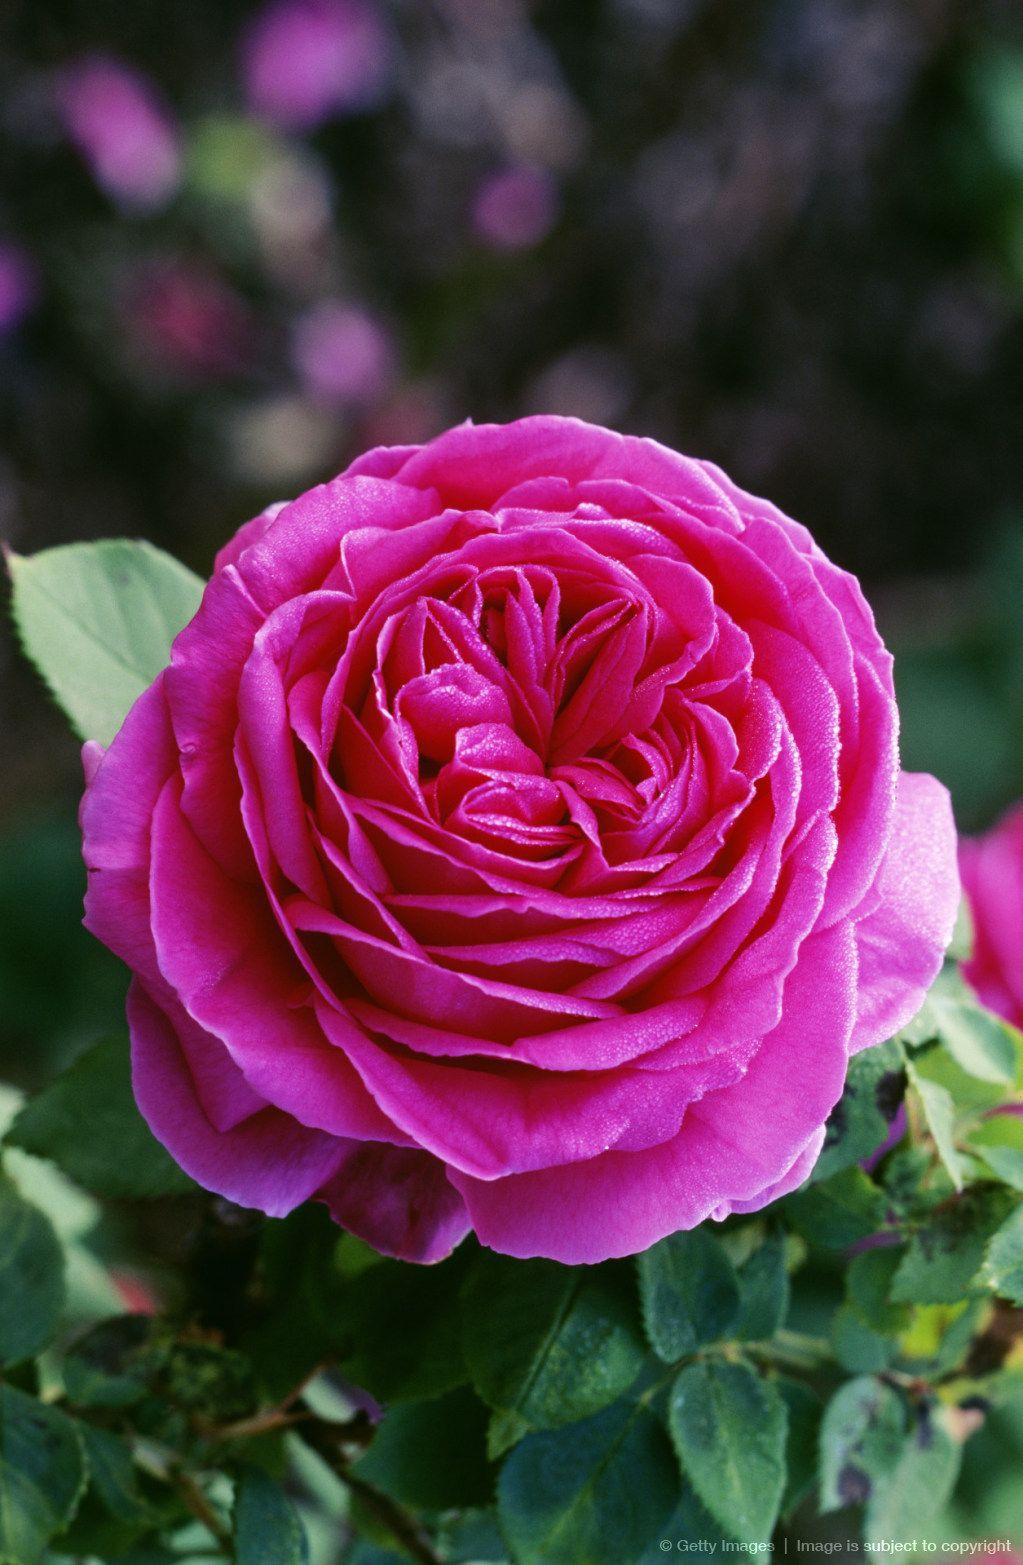 rose othello  English shrub rose breed by David Austin